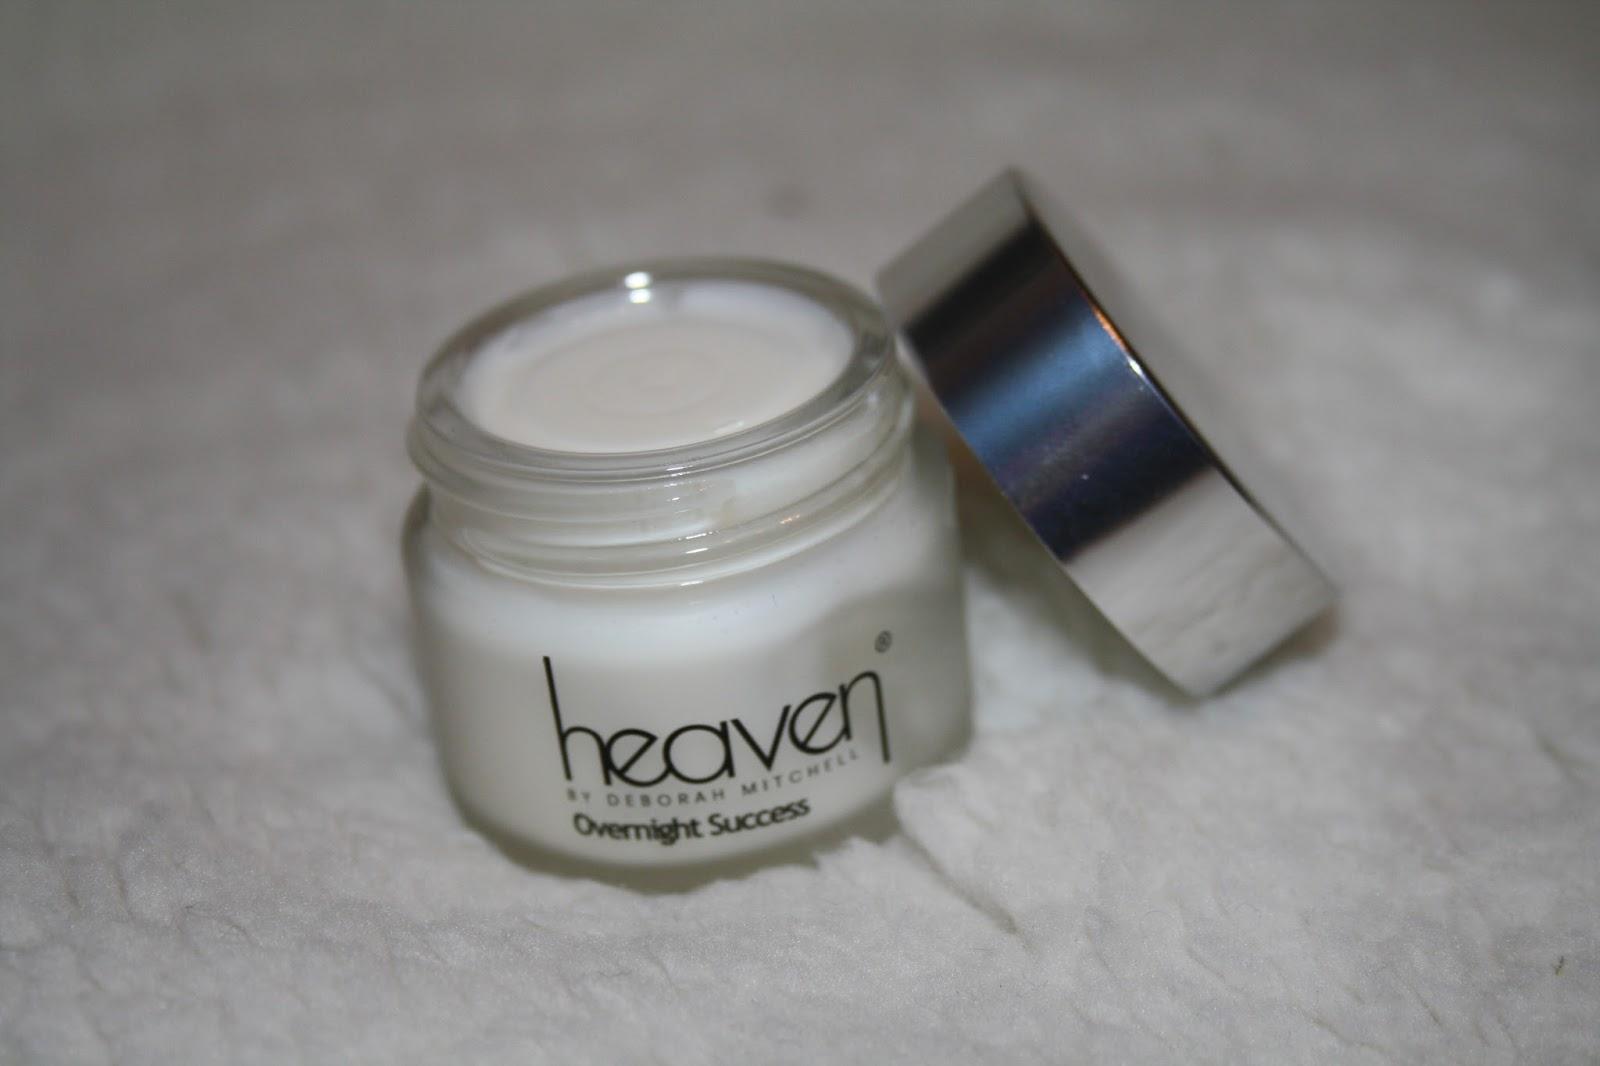 Heaven Skincare Overnight Success Cream